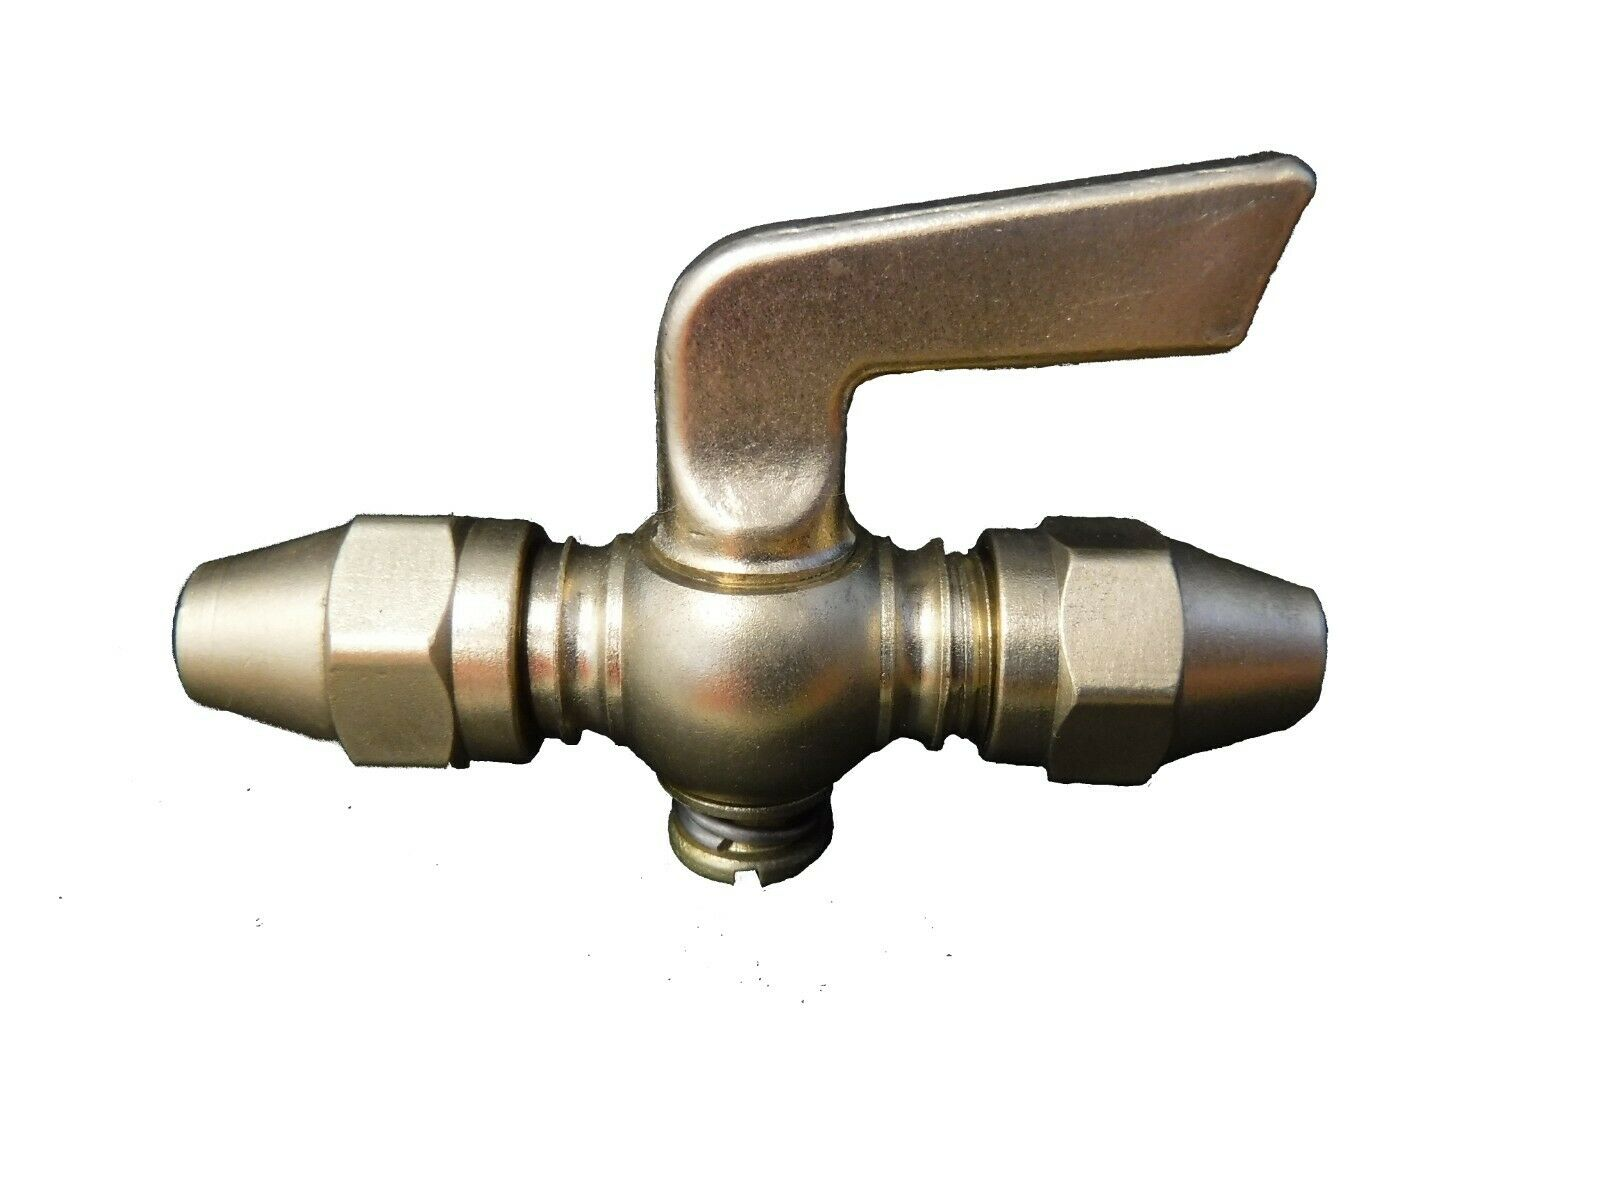 1//4 Inch FNPT Thread  Brass Drain Pet Cock Shut Off Valve Fuel Gas Oil Air